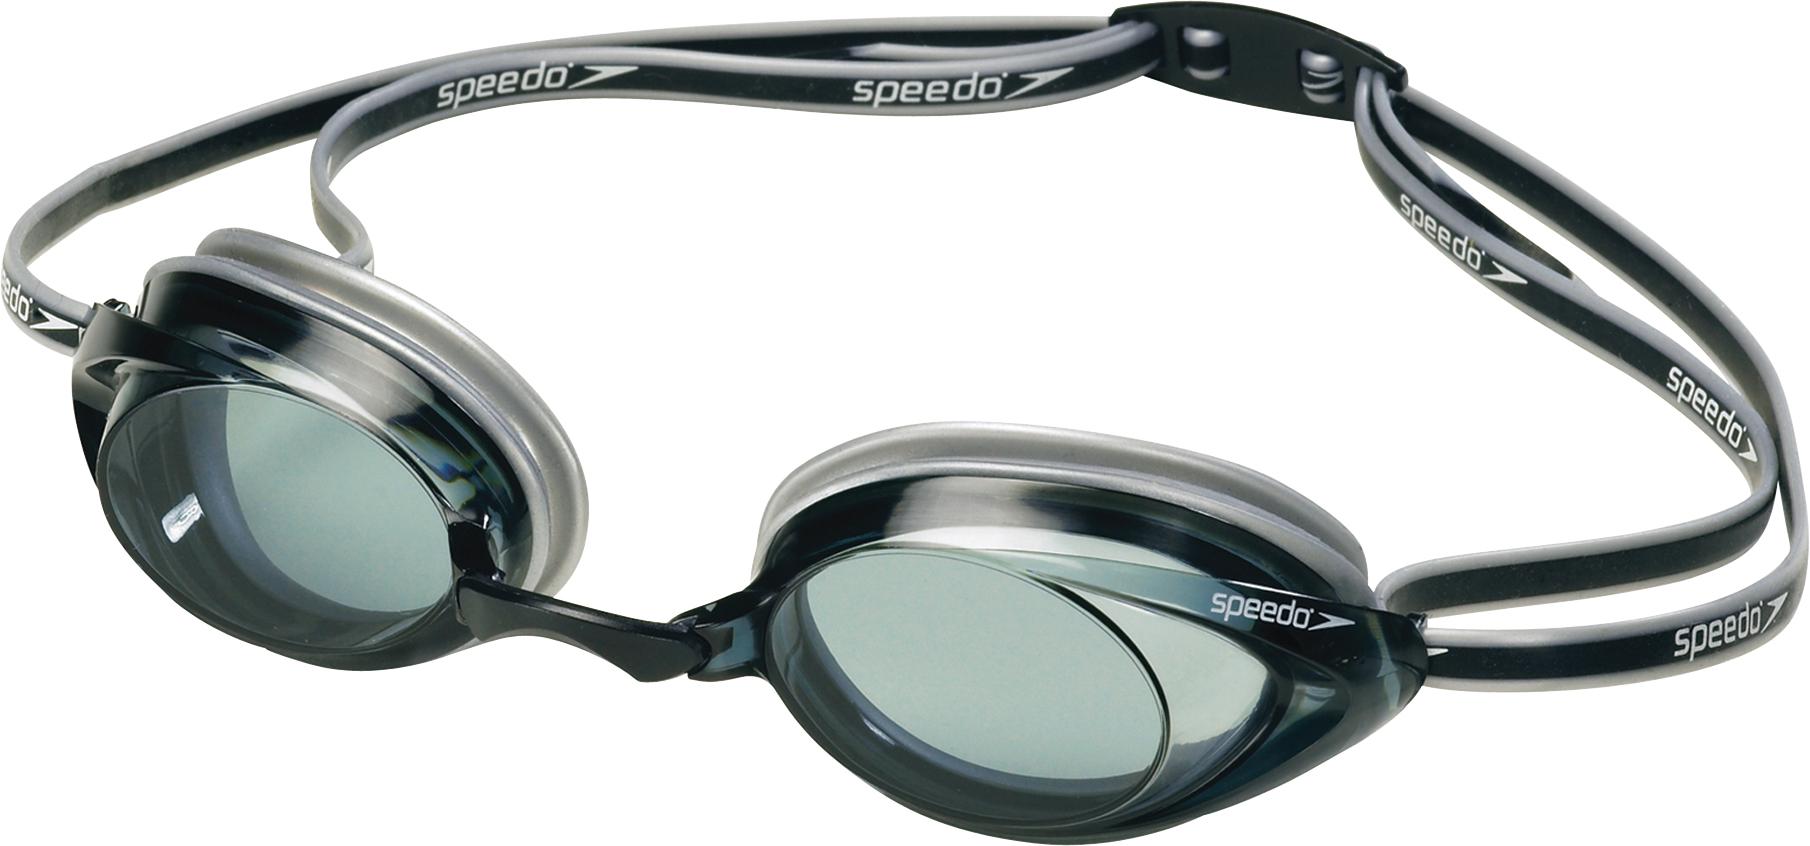 229249258e1 Speedo Vanquisher 2.0 Goggles - Unisex | MEC